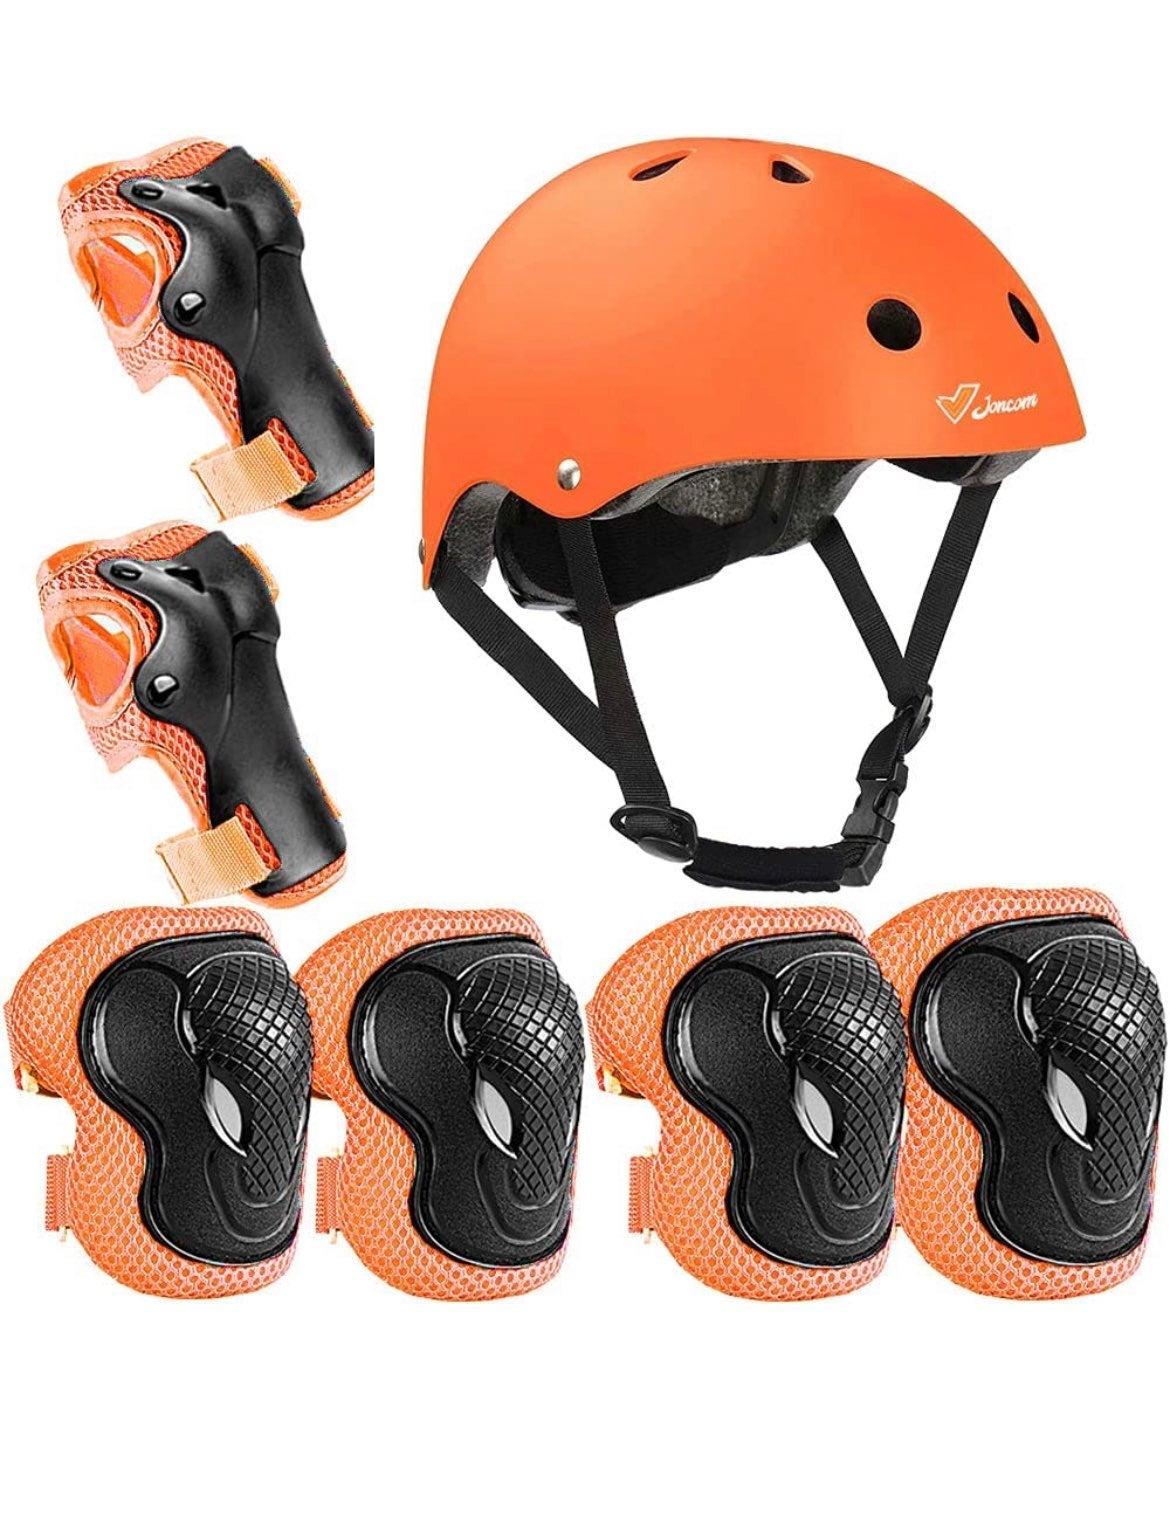 Kids Protective Gear Set for Skateboard